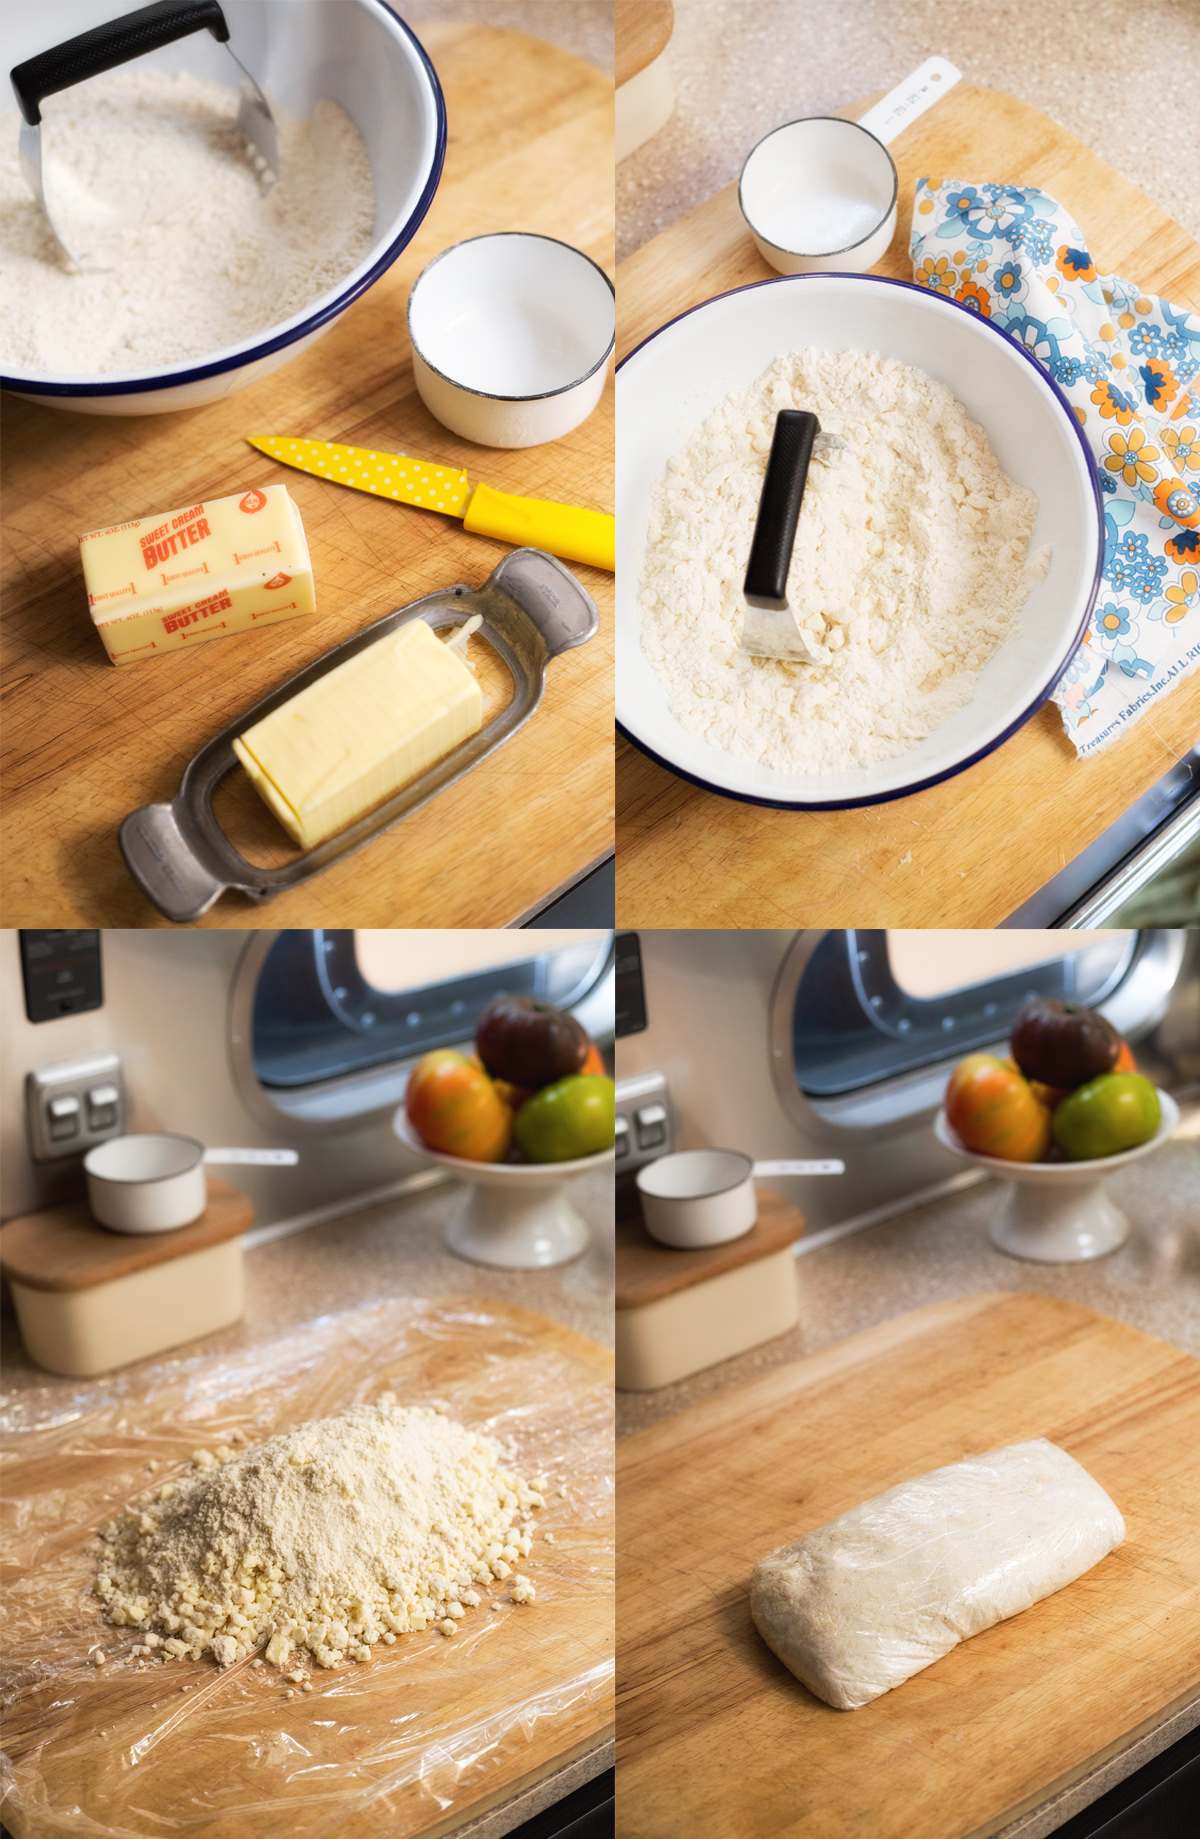 Foolproof Pie Crust recipe via J5MM.com